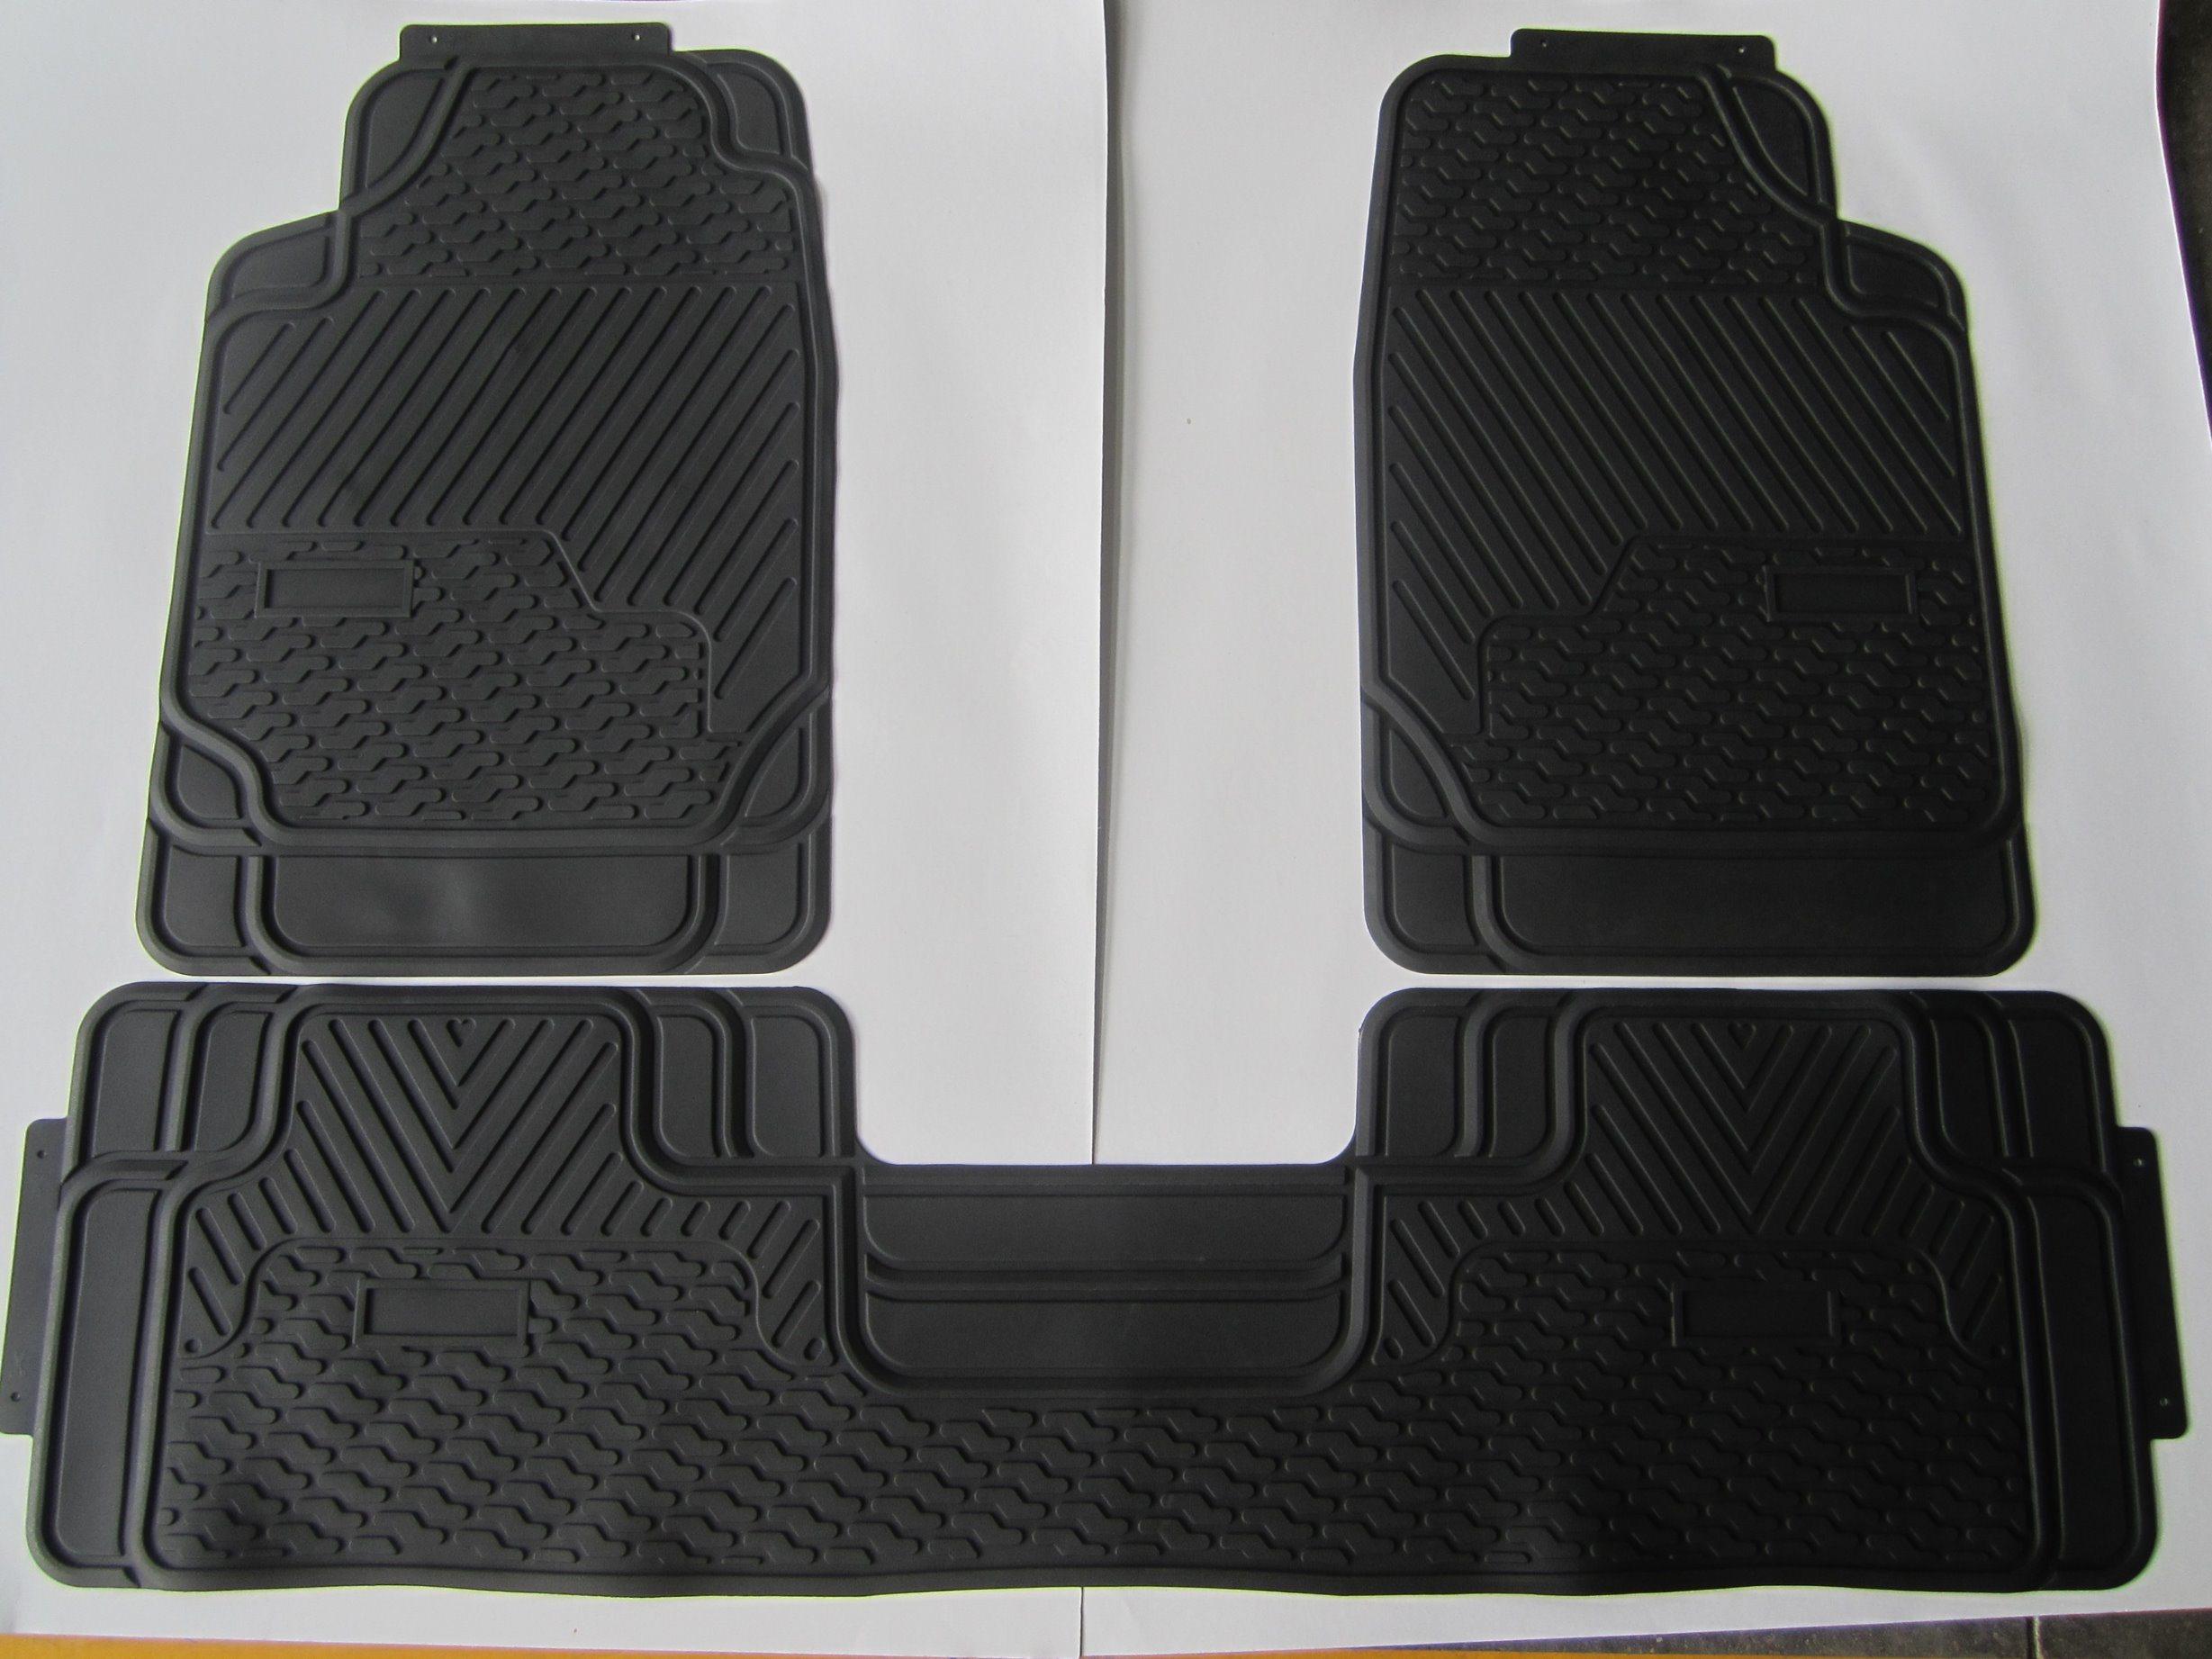 (BT 102-86) PVC Car Mats (Client Item Number: EVO 1003N and AR1003B)